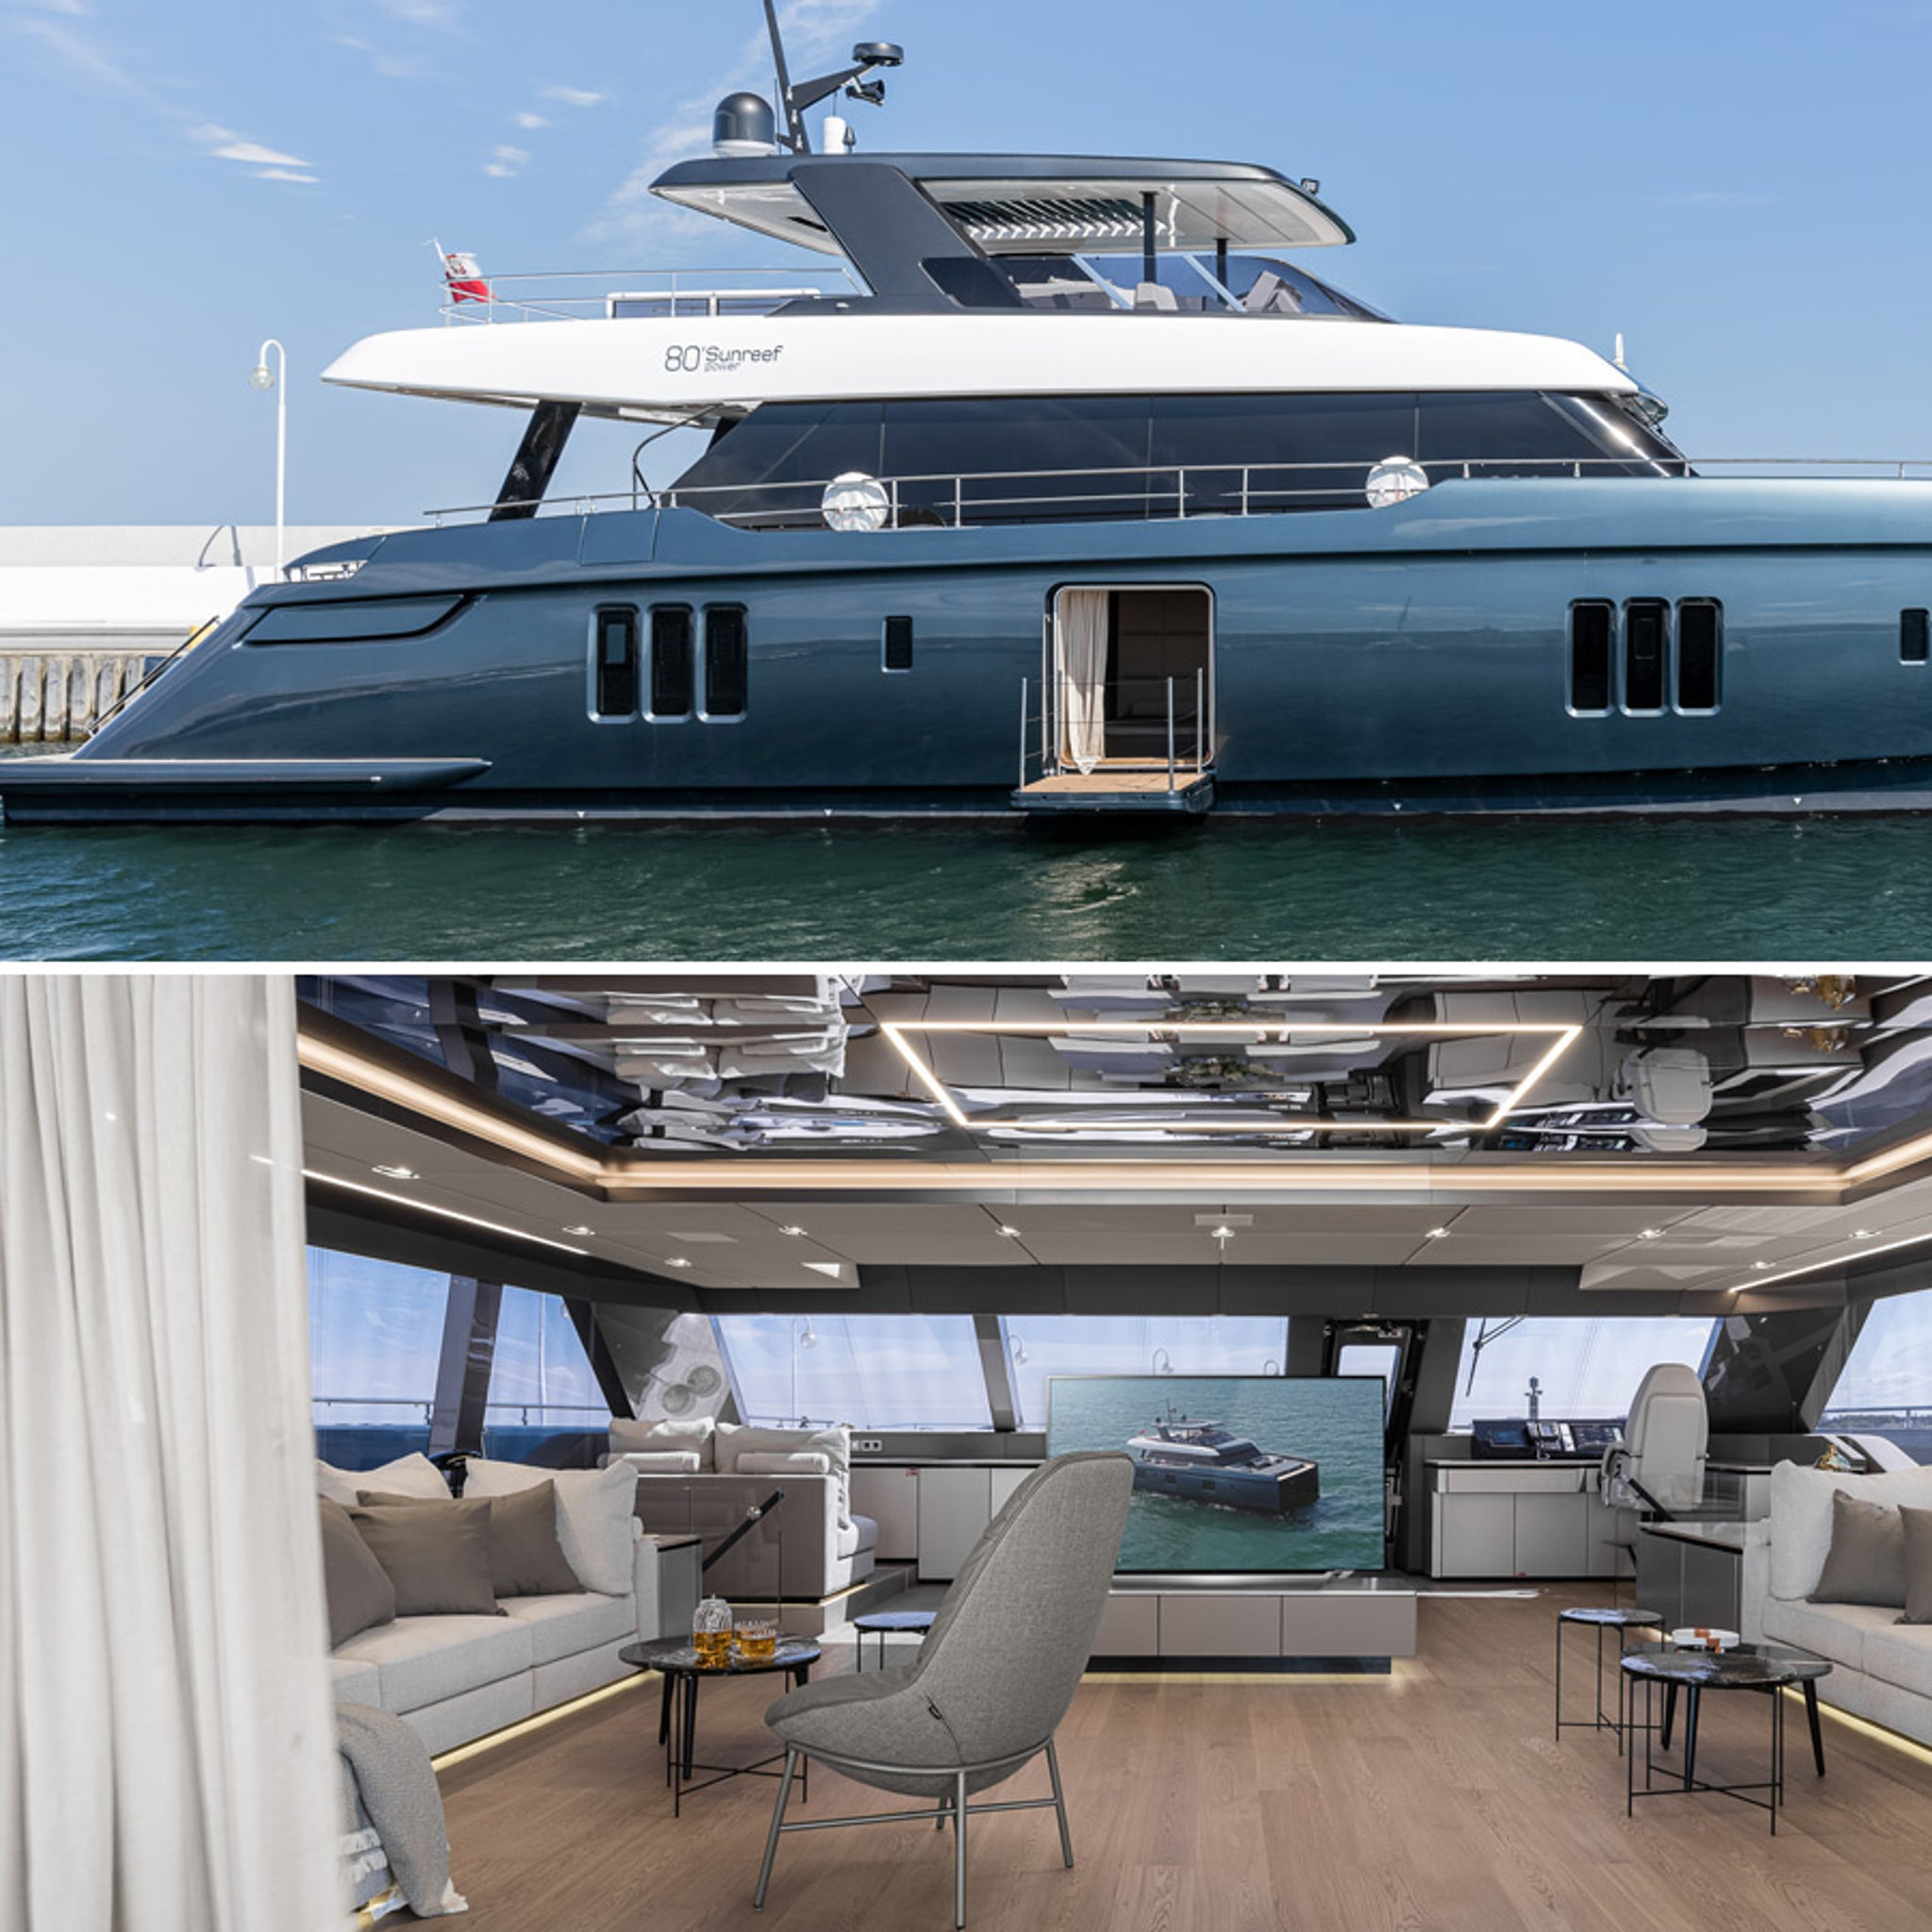 Rafael Nadal Drops Millions On Custom 79 Foot Luxury Yacht